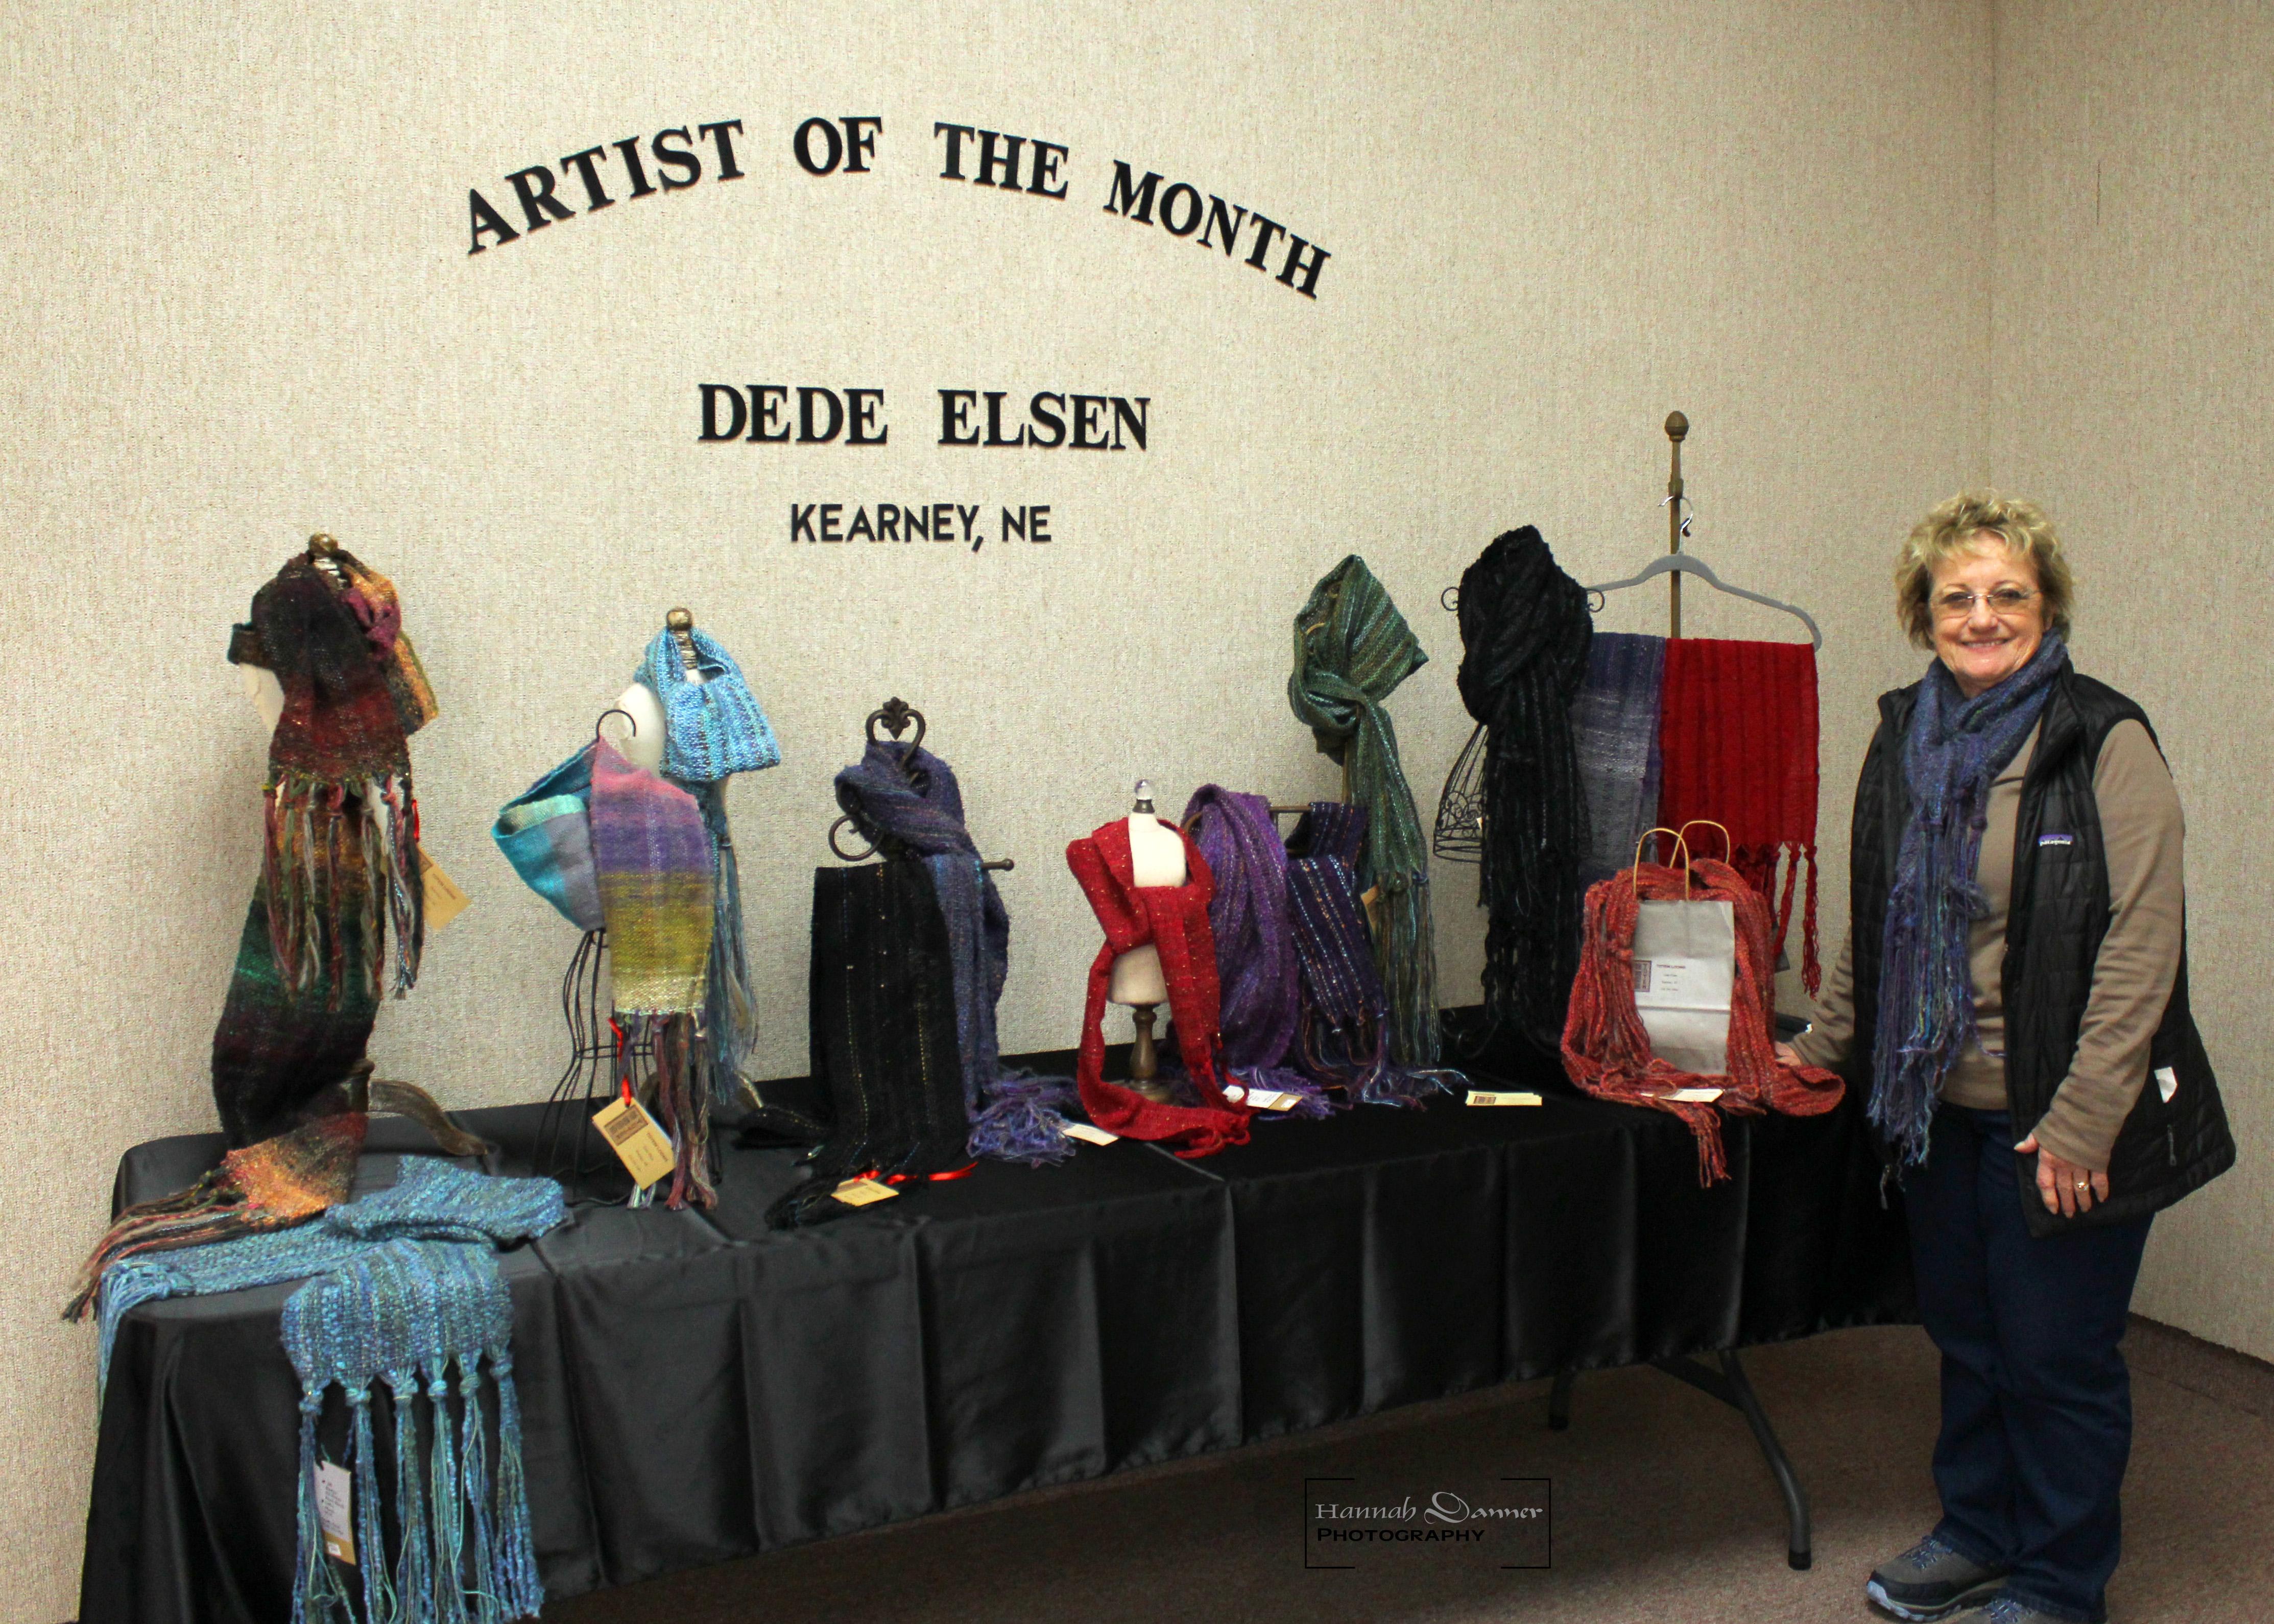 January Artist of the Month - Dede Elsen